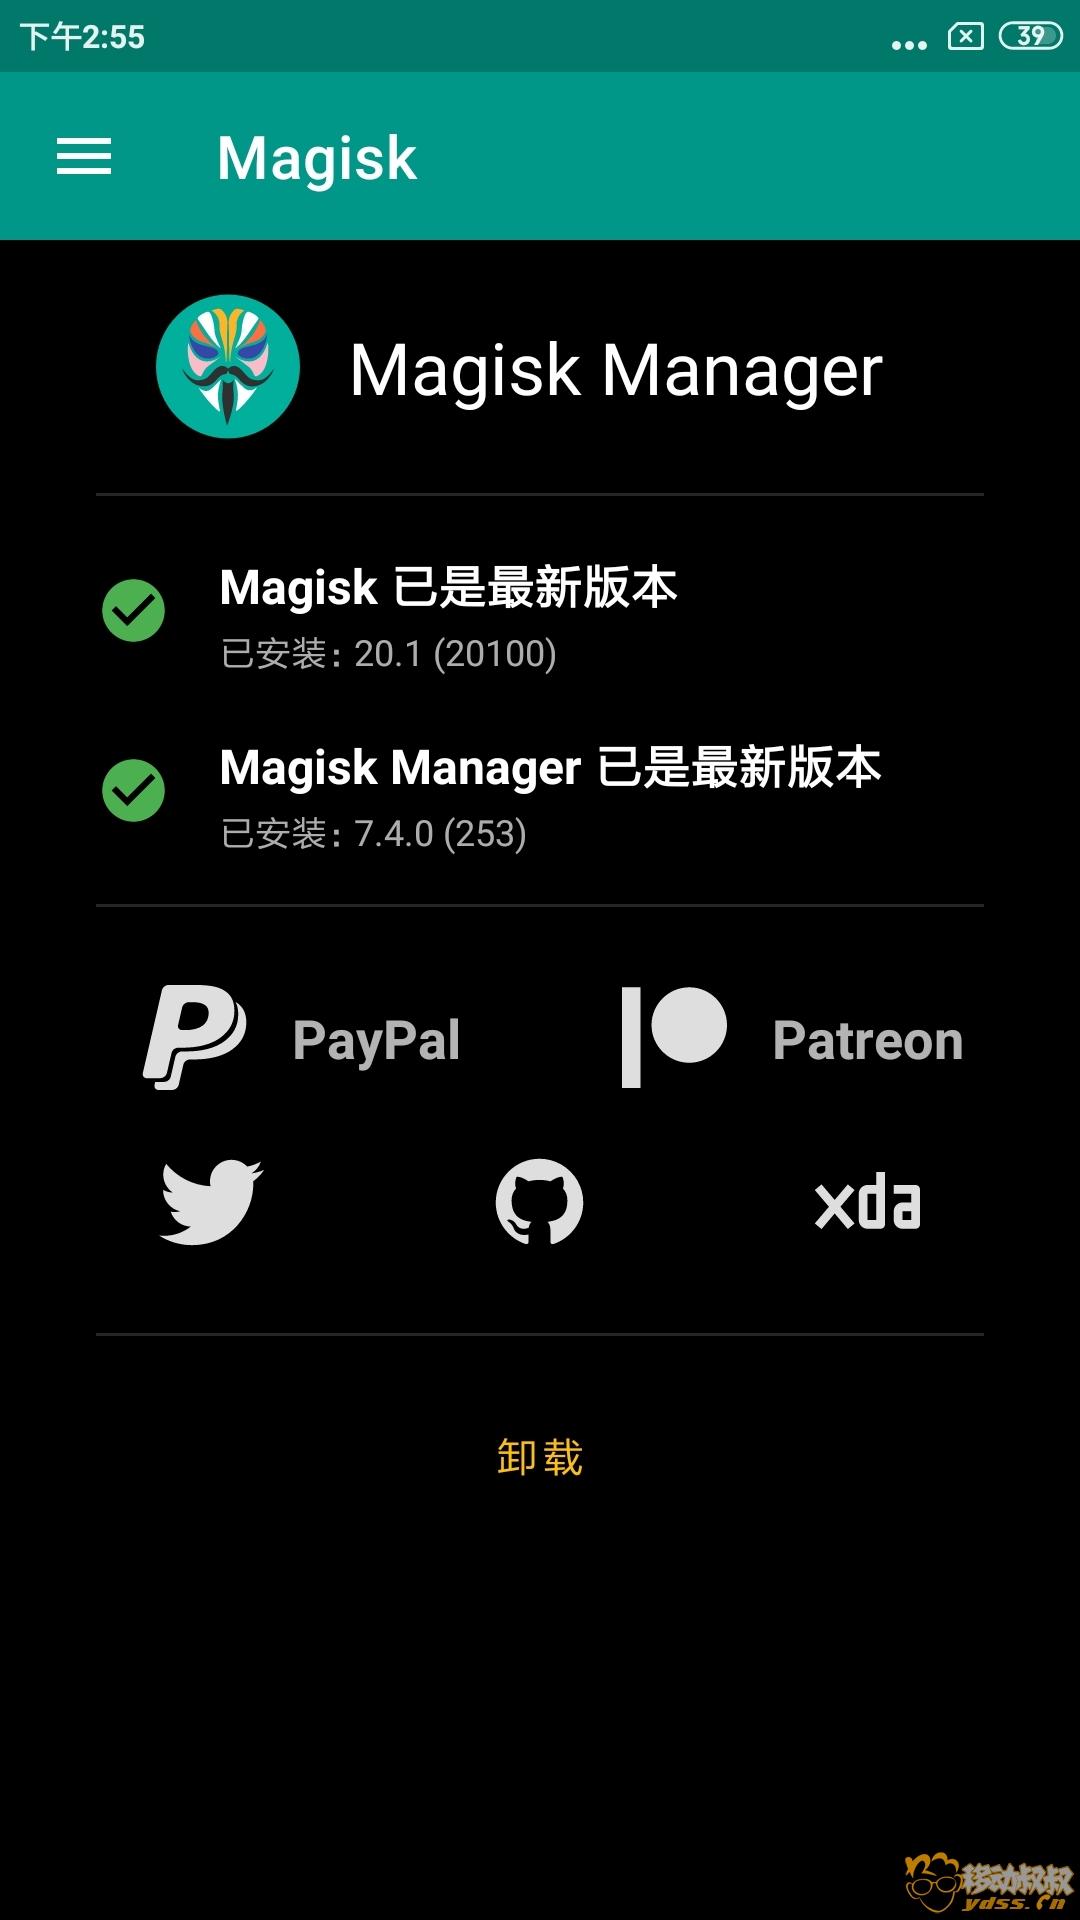 Screenshot_2019-11-28-14-55-12-957_com.topjohnwu.magisk.jpg